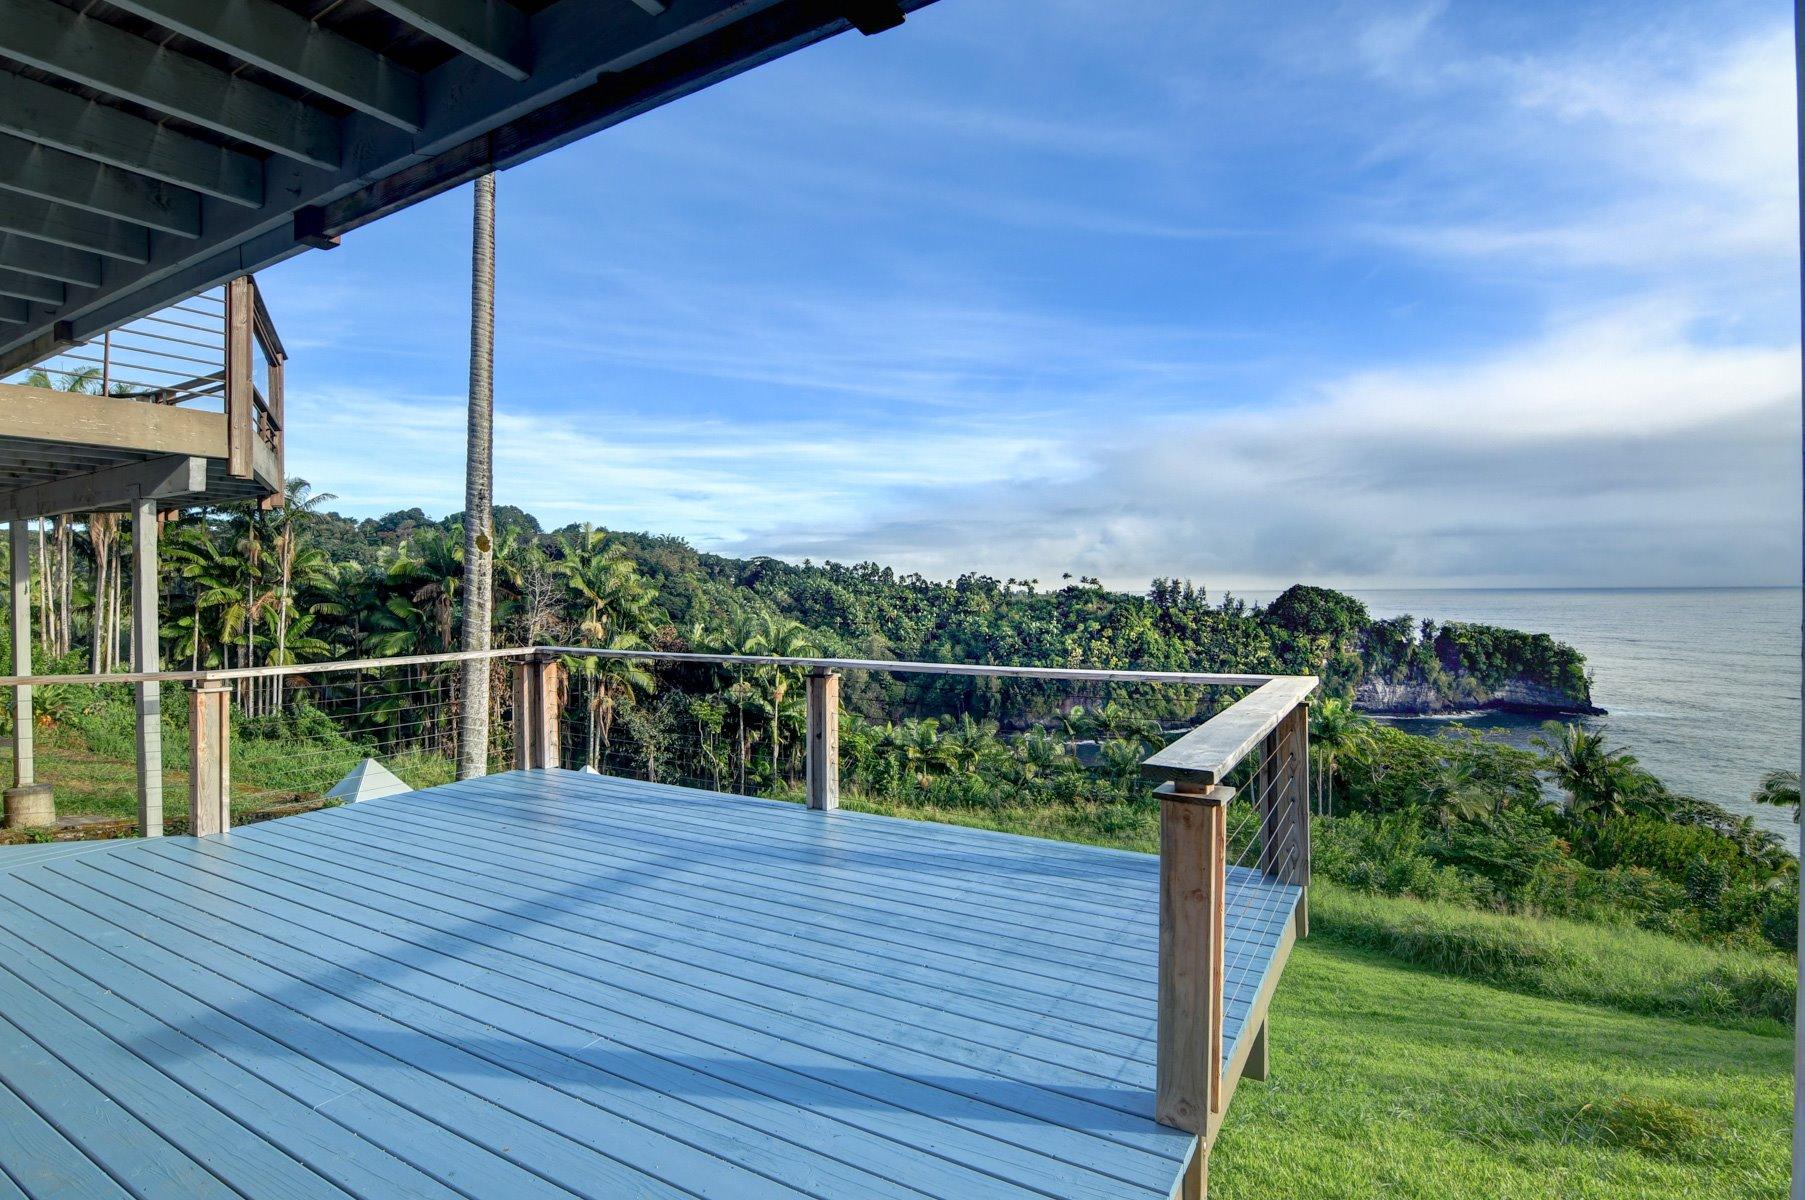 Bottom floor recently installed yoga platform and wrap around deck.